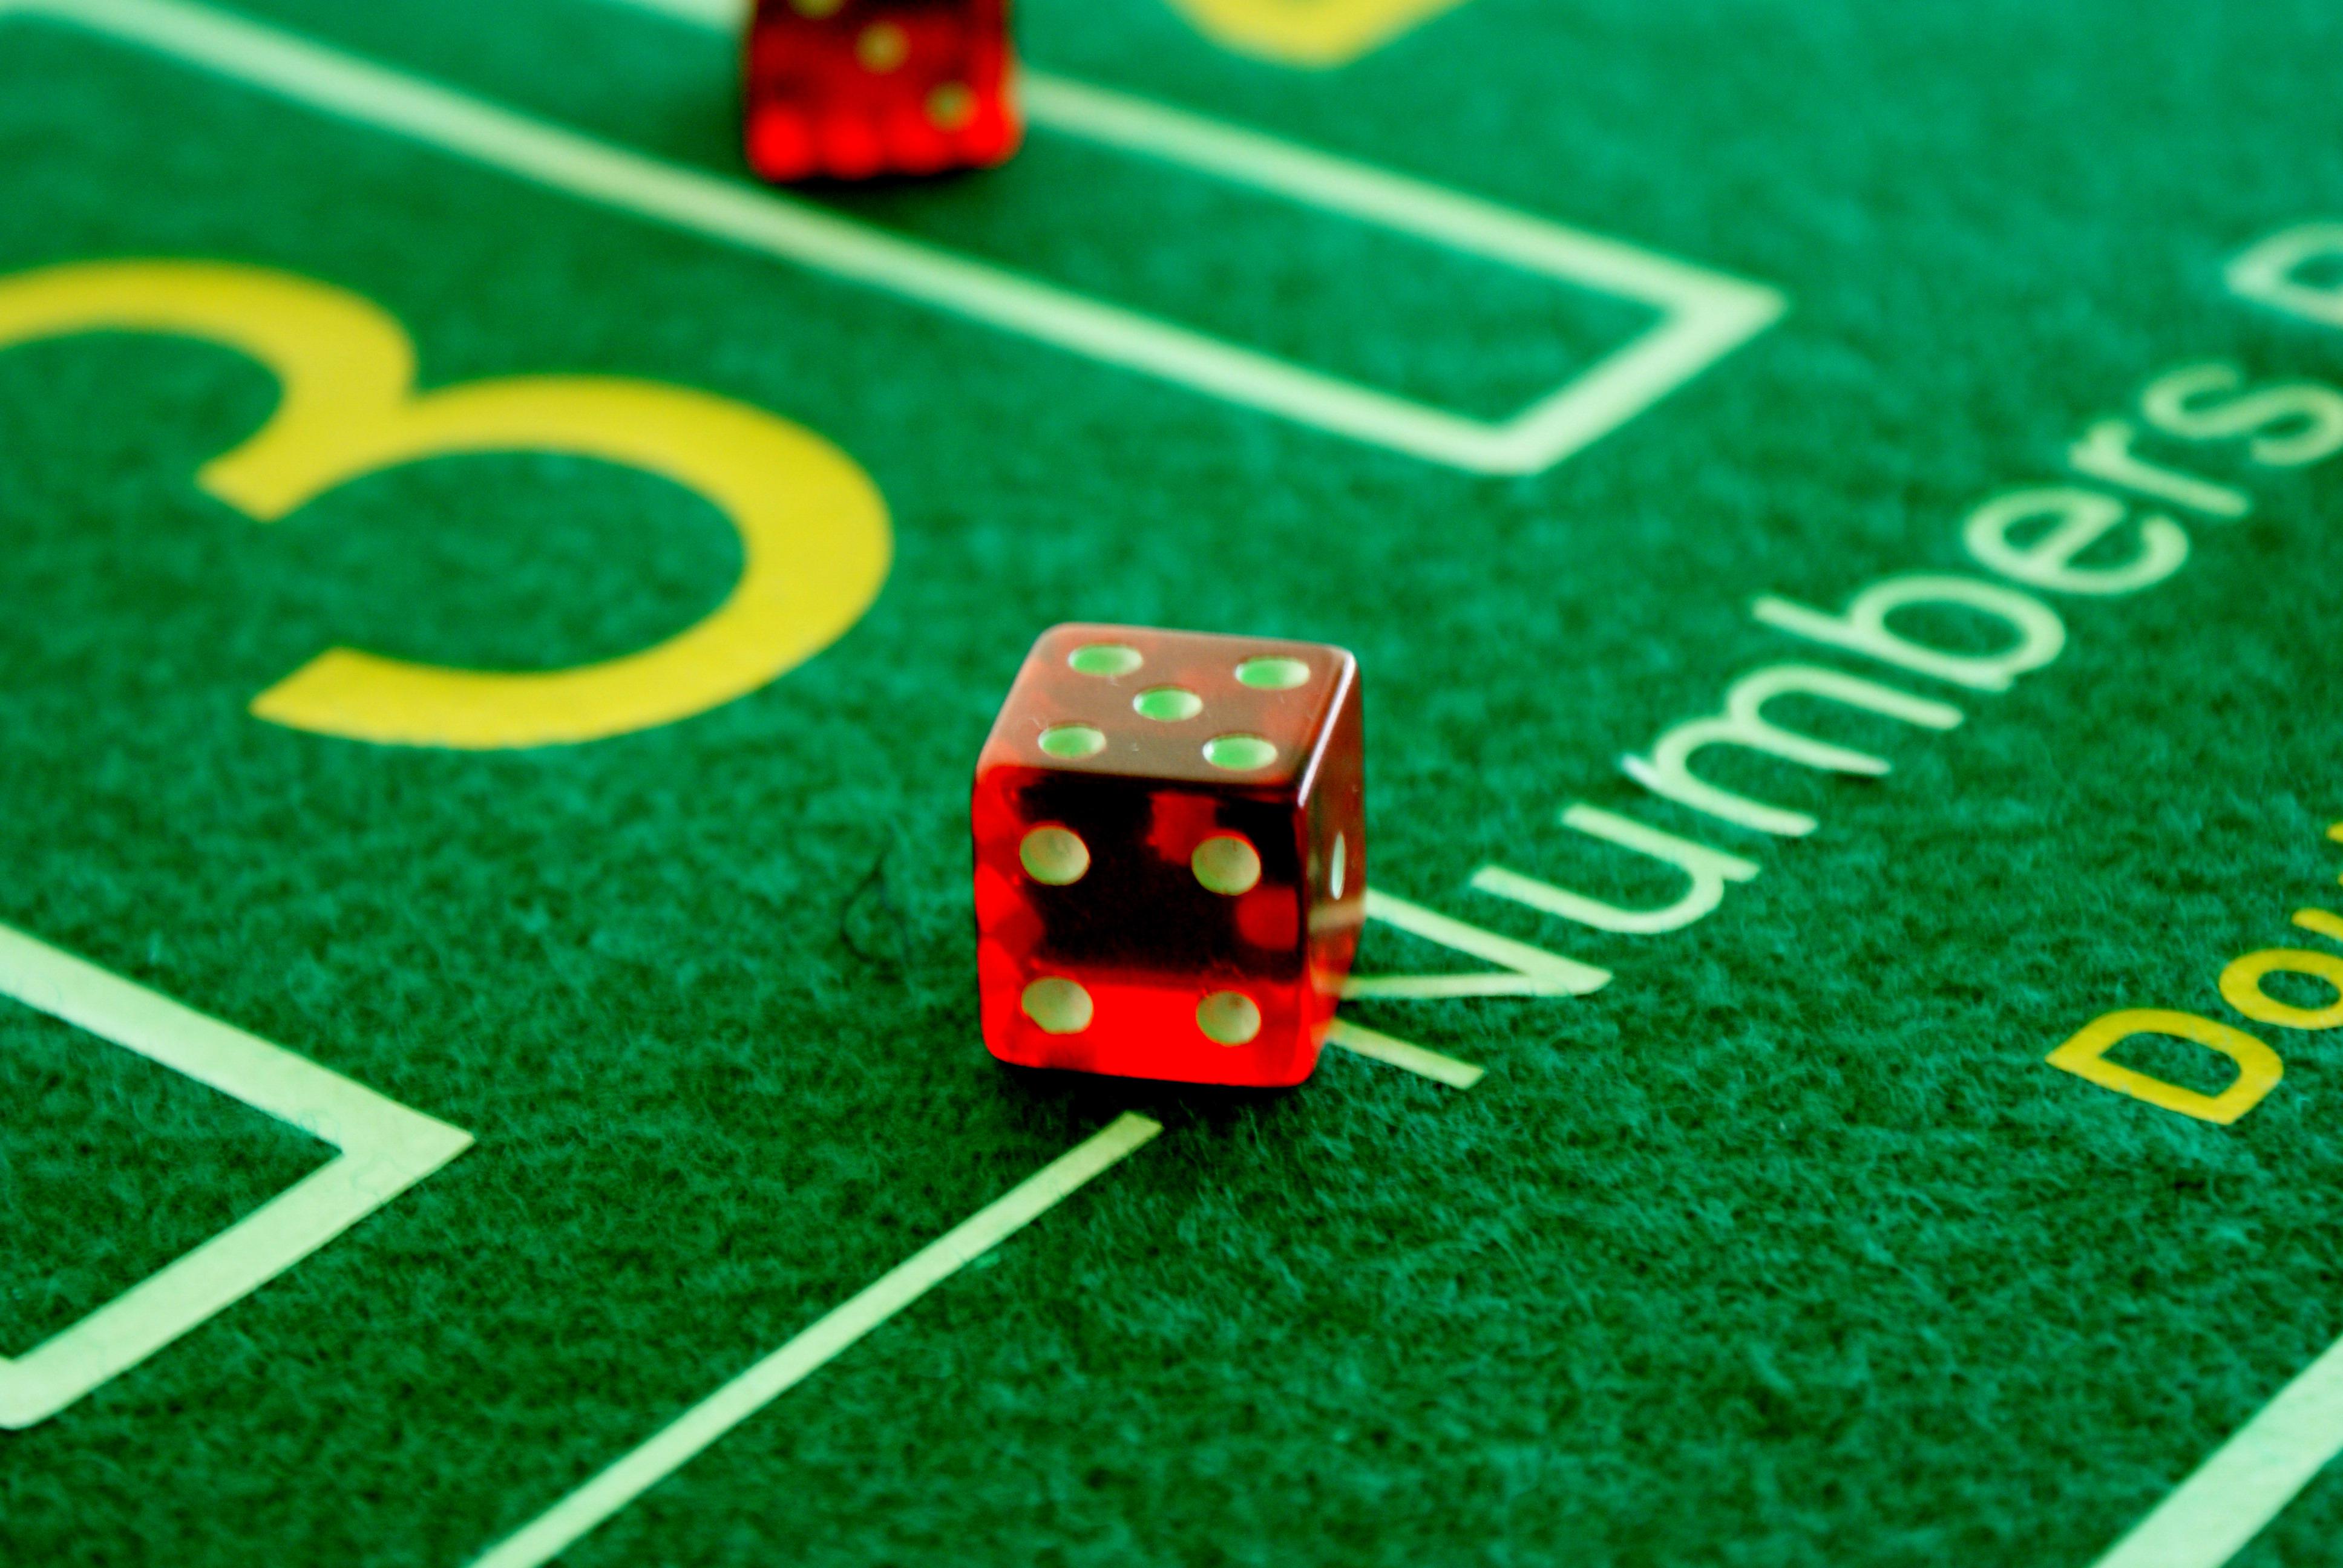 Red Dice, Casino, Dice, Gamble, Game, HQ Photo